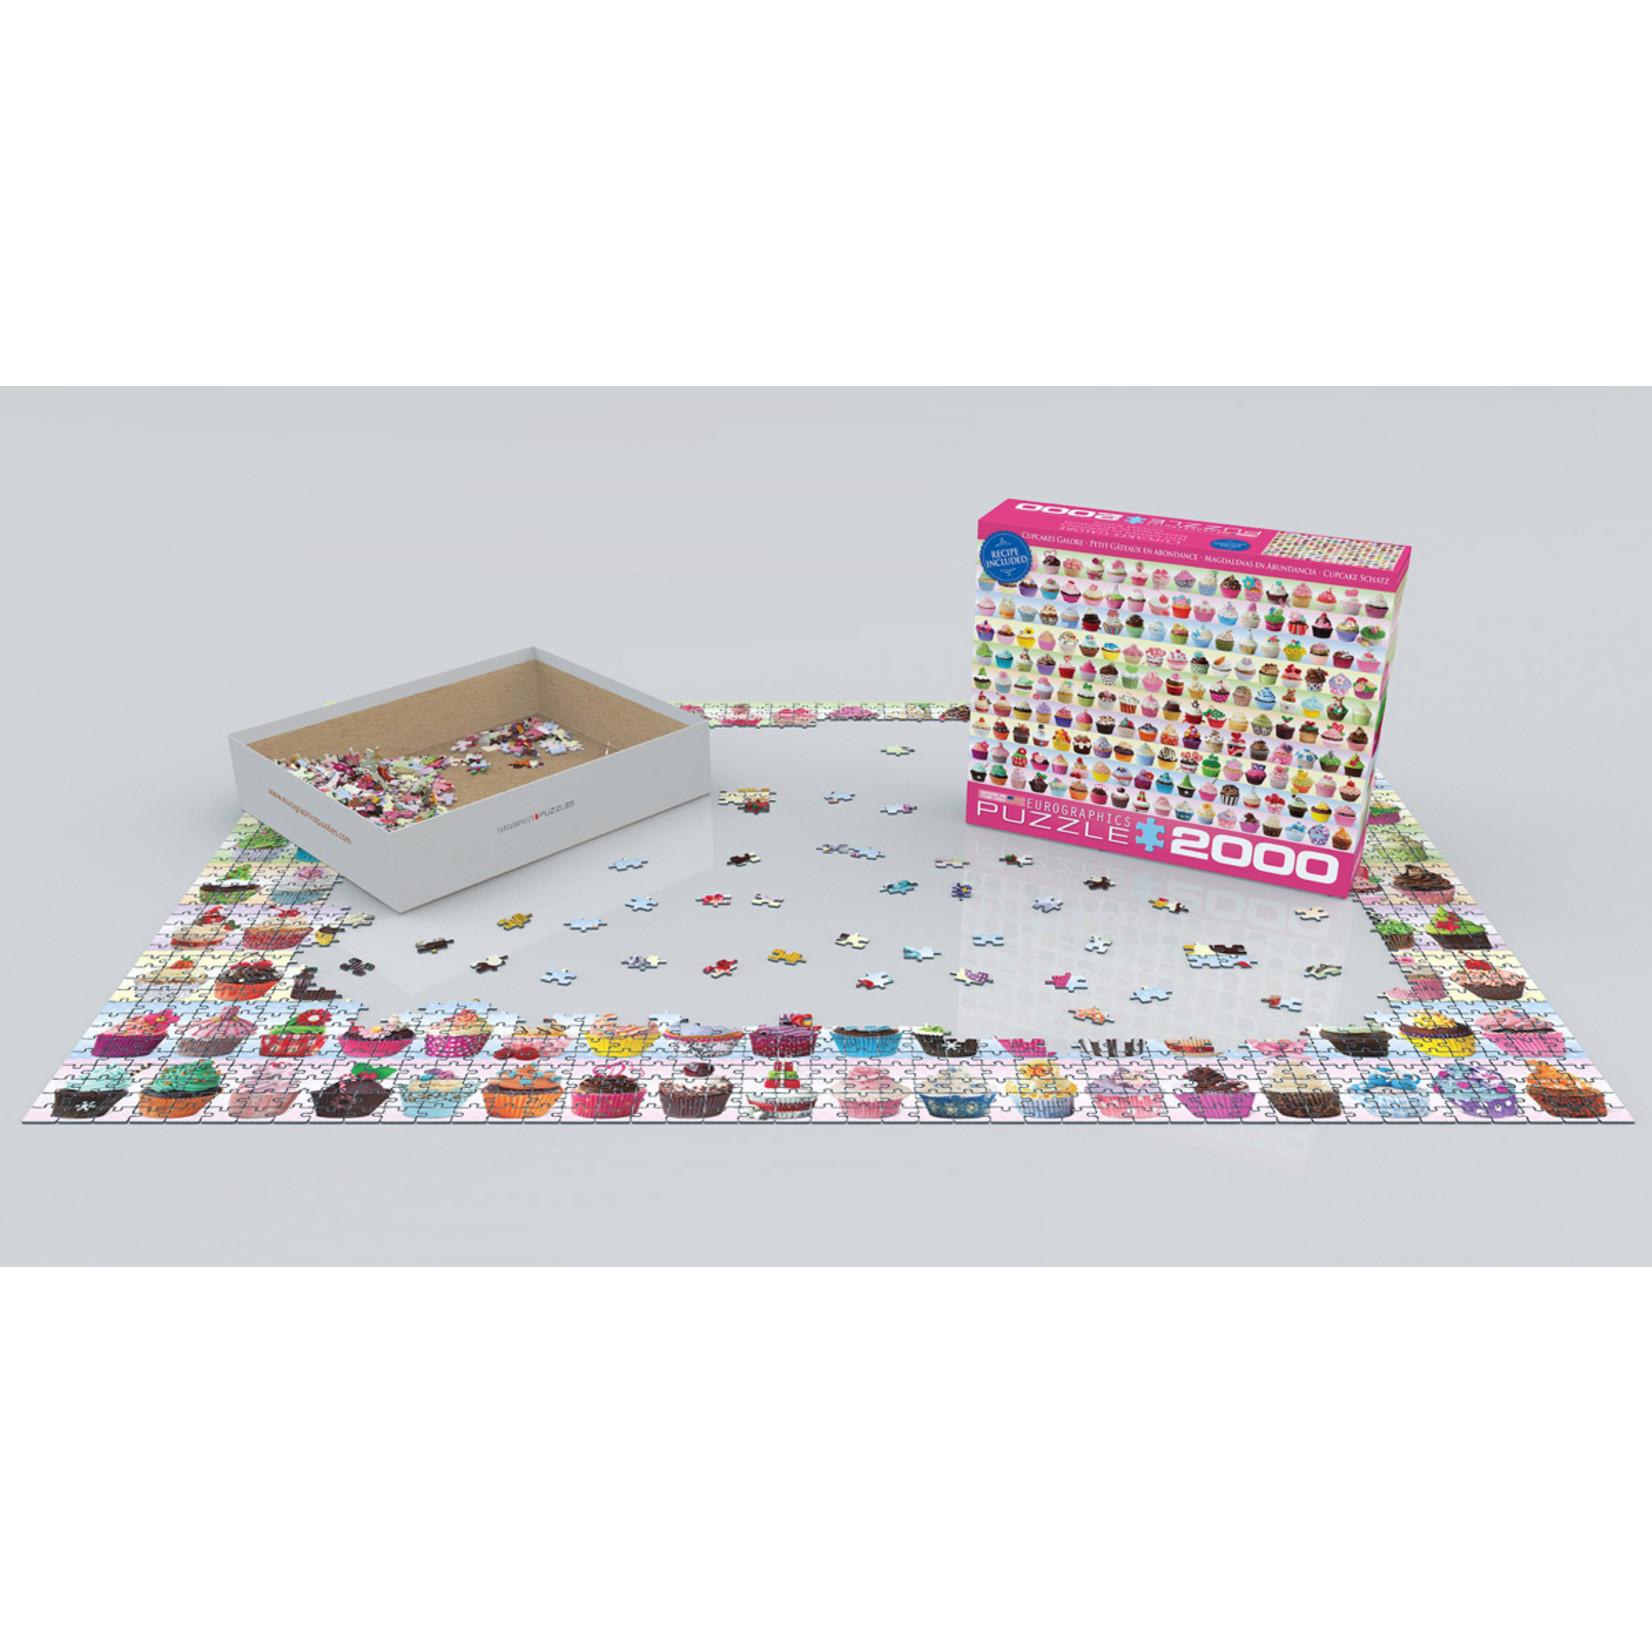 EuroGraphics Puzzles Cupcakes Galore 2000pc